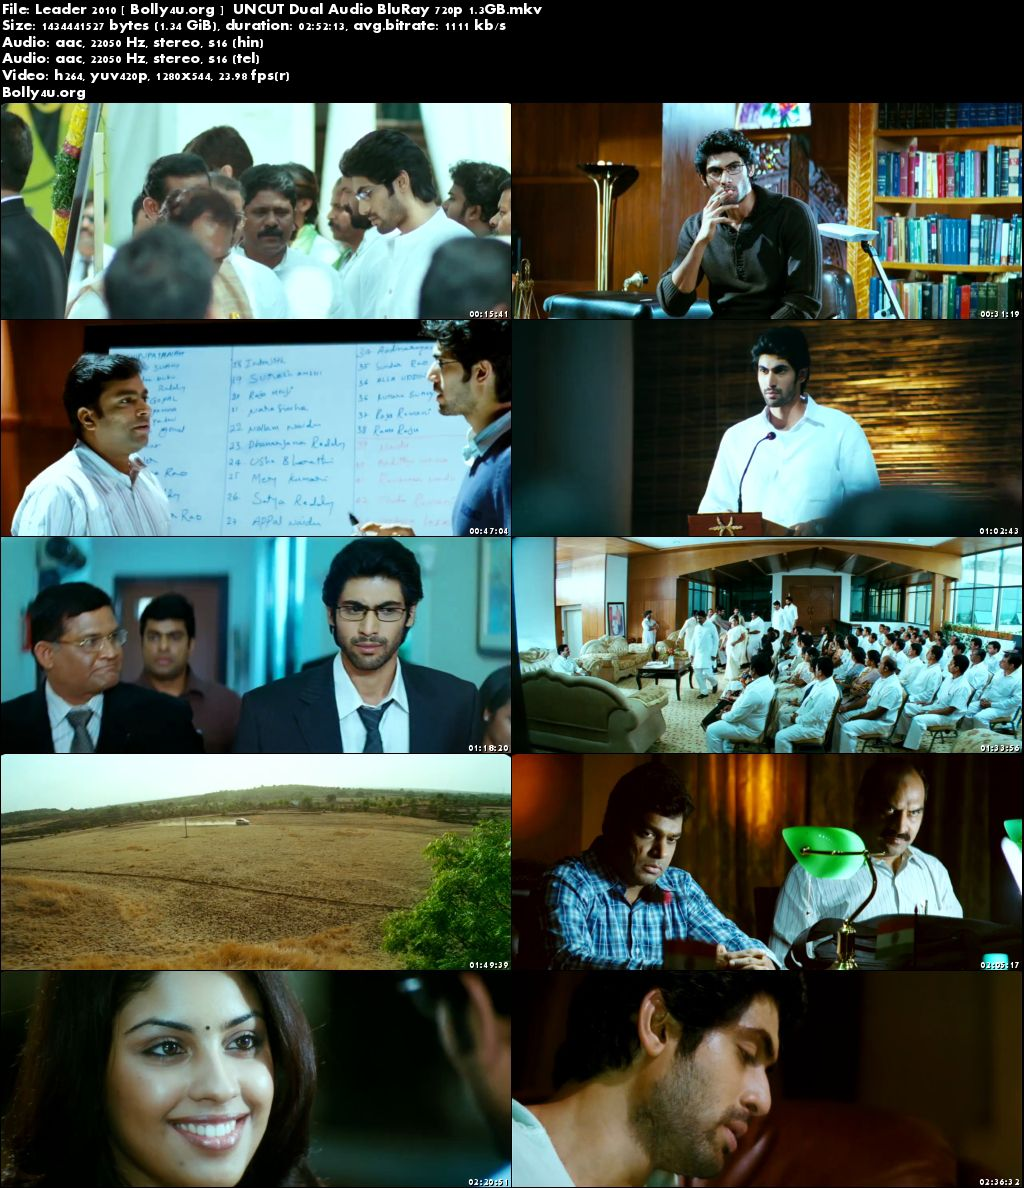 Leader 2010 BluRay 1.3GB UNCUT Hindi Dual Audio 720p Download